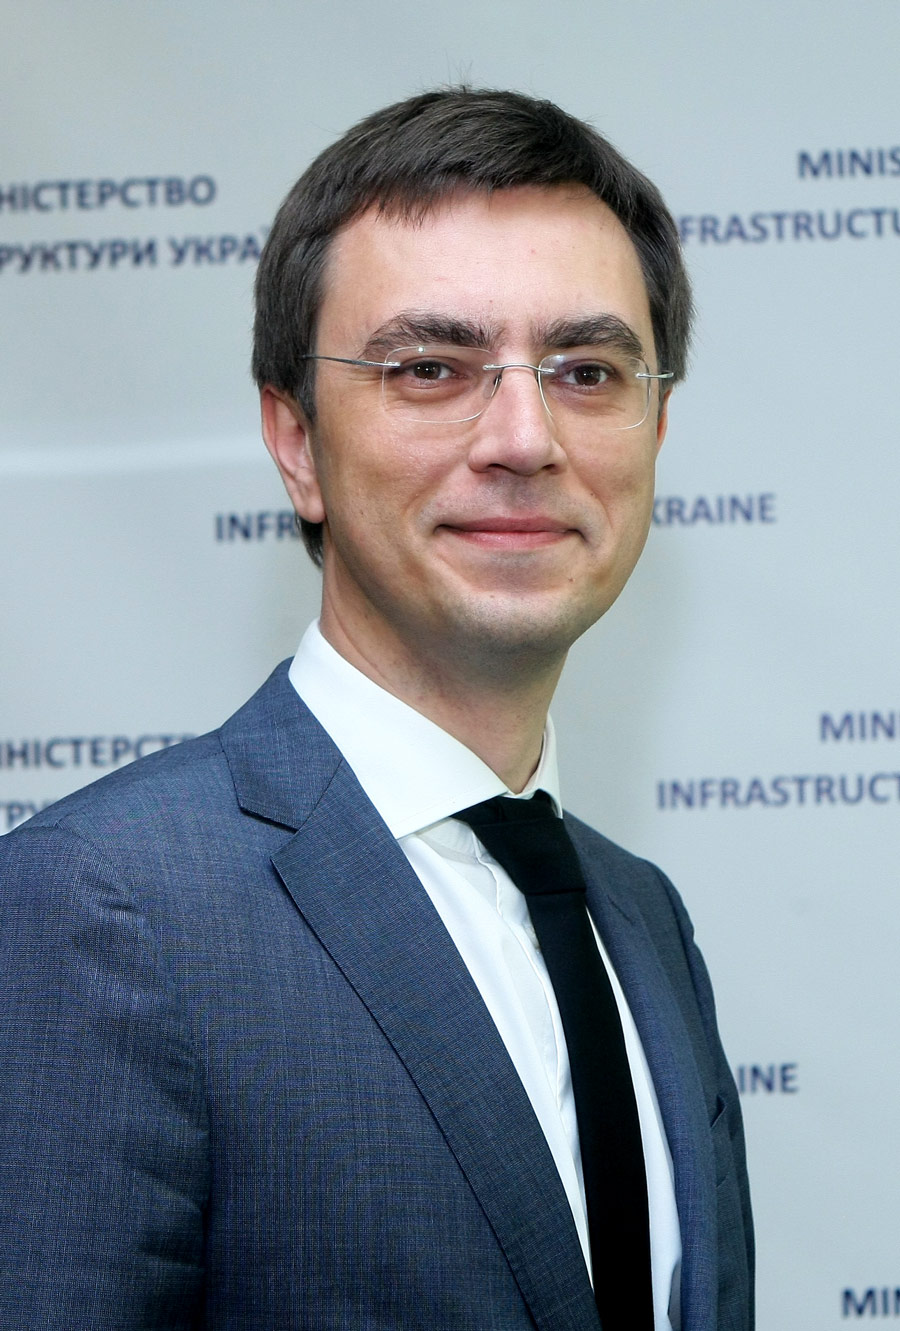 Volodymyr Omelyan, Minister of Infrastructure